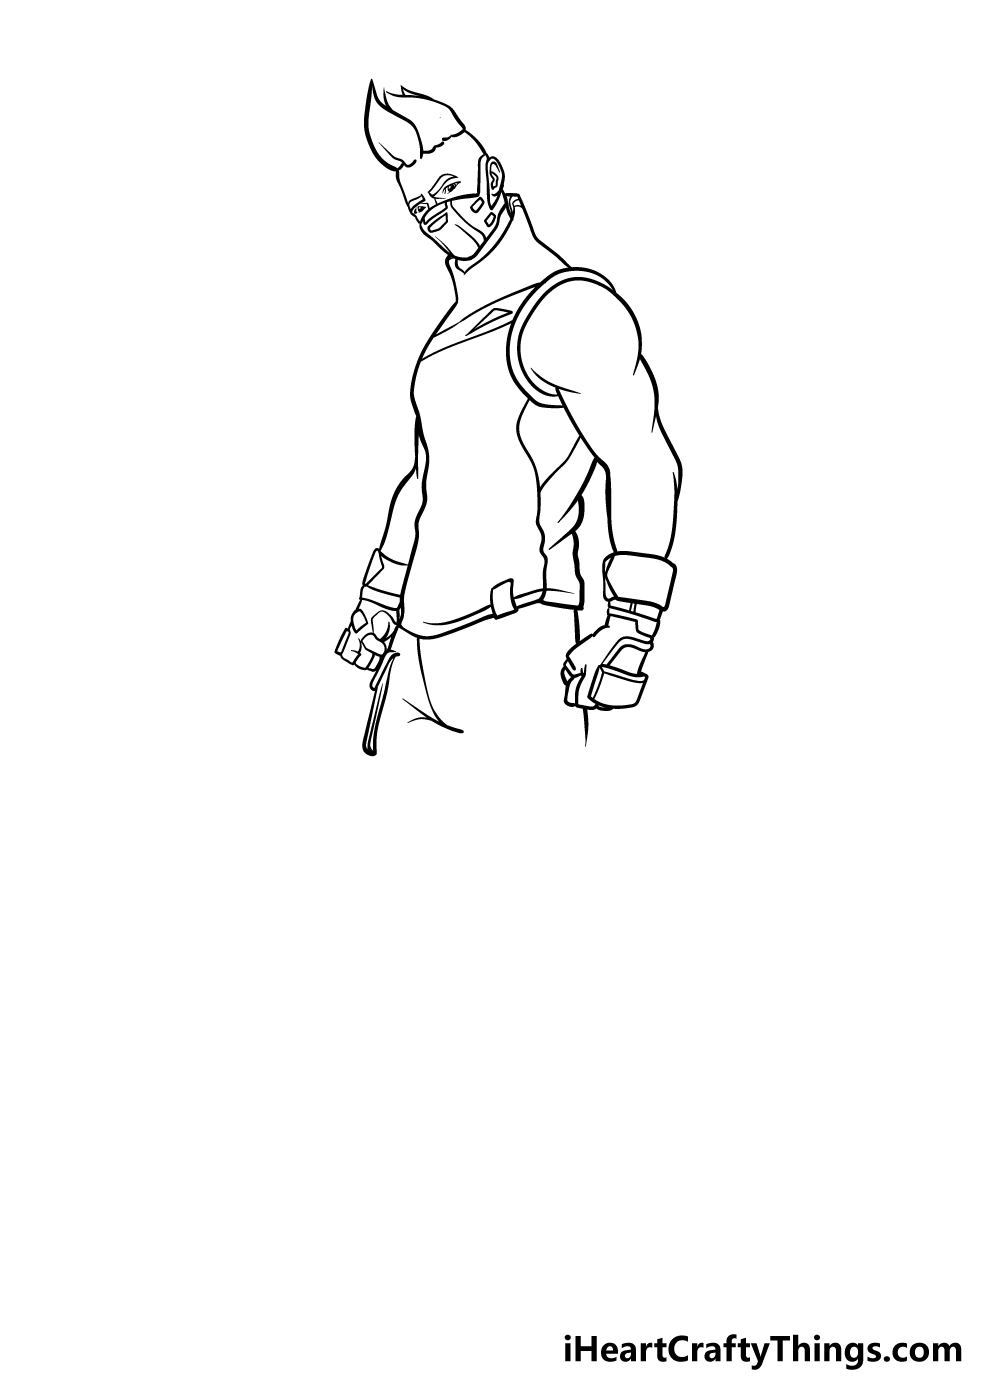 fortnite drawing step 6